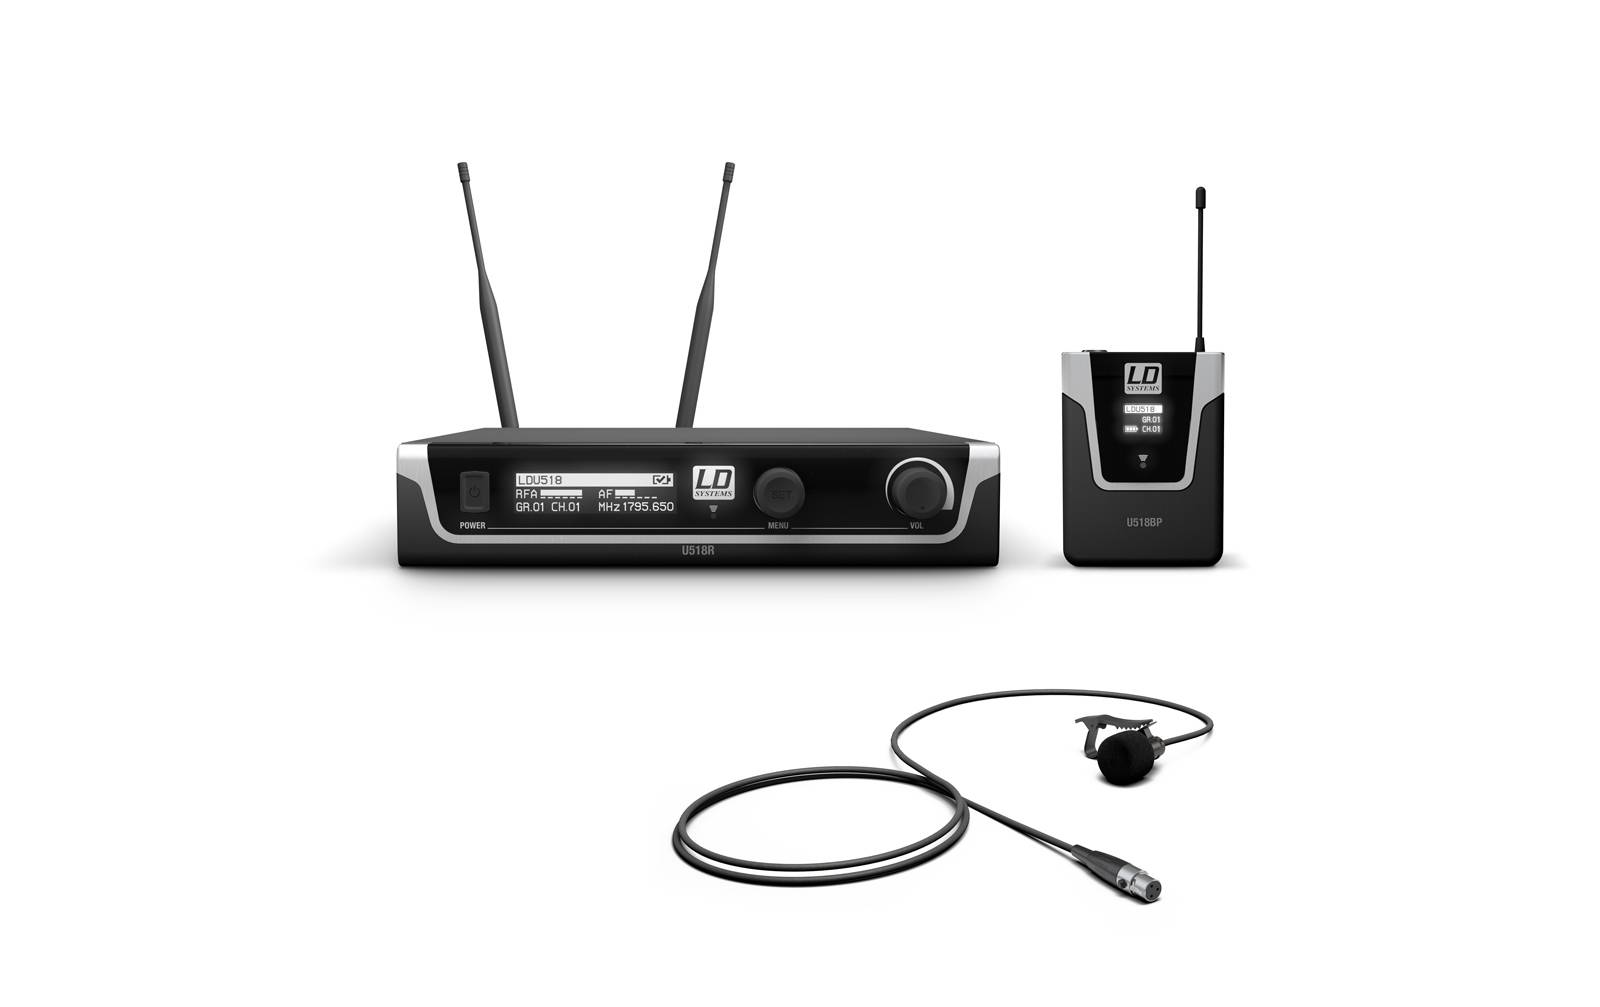 ld-systems-u518-bpl-funkmikrofon-system-mit-bodypack-und-lavalier-mikrofon